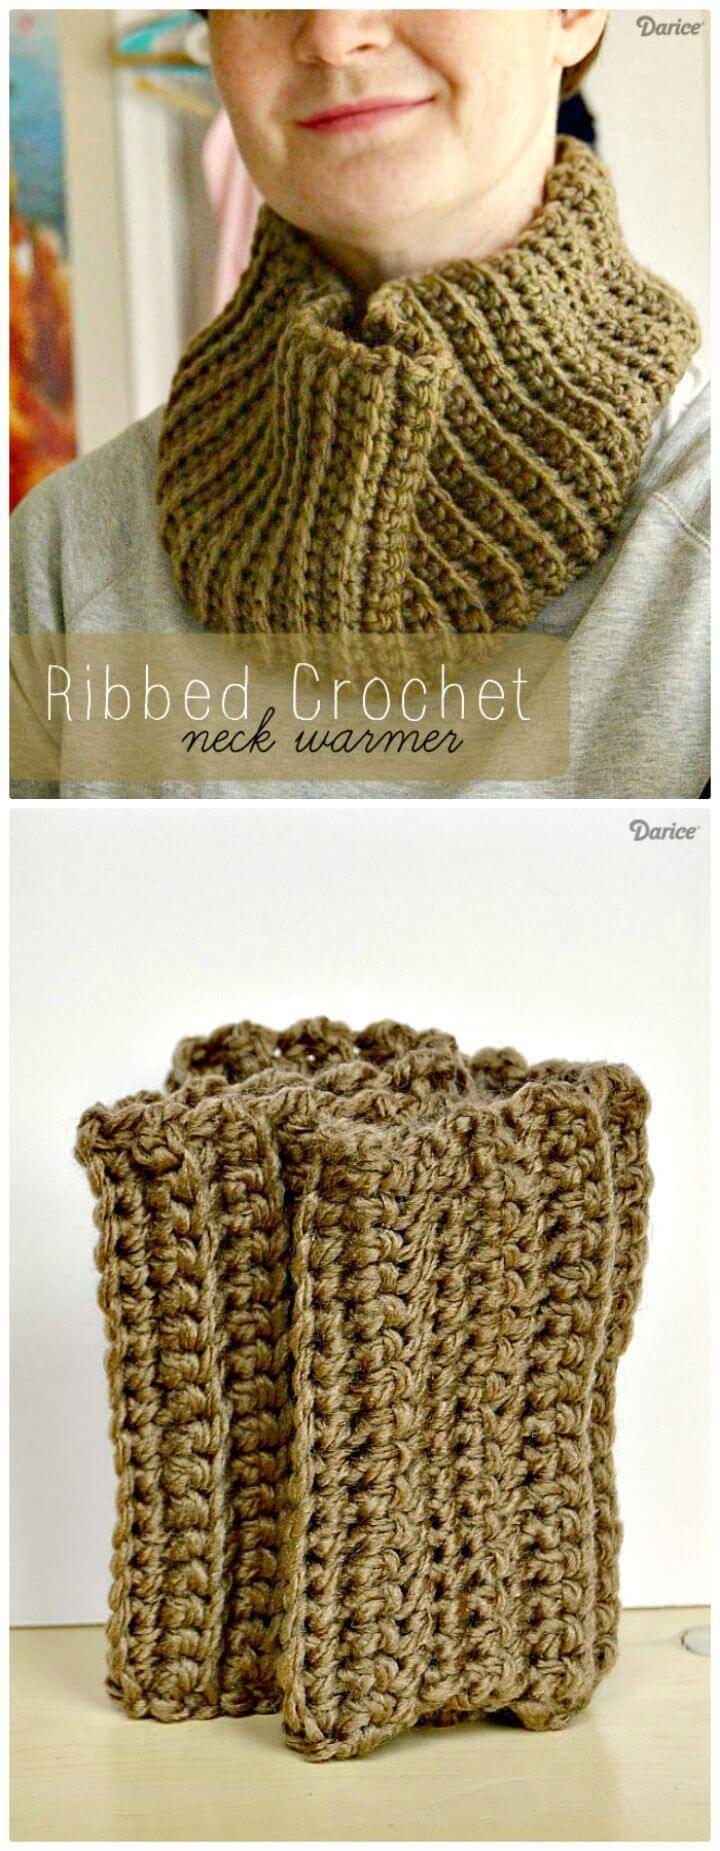 Crochet Neck Warmer - 8 Free Crochet Patterns - DIY & Crafts